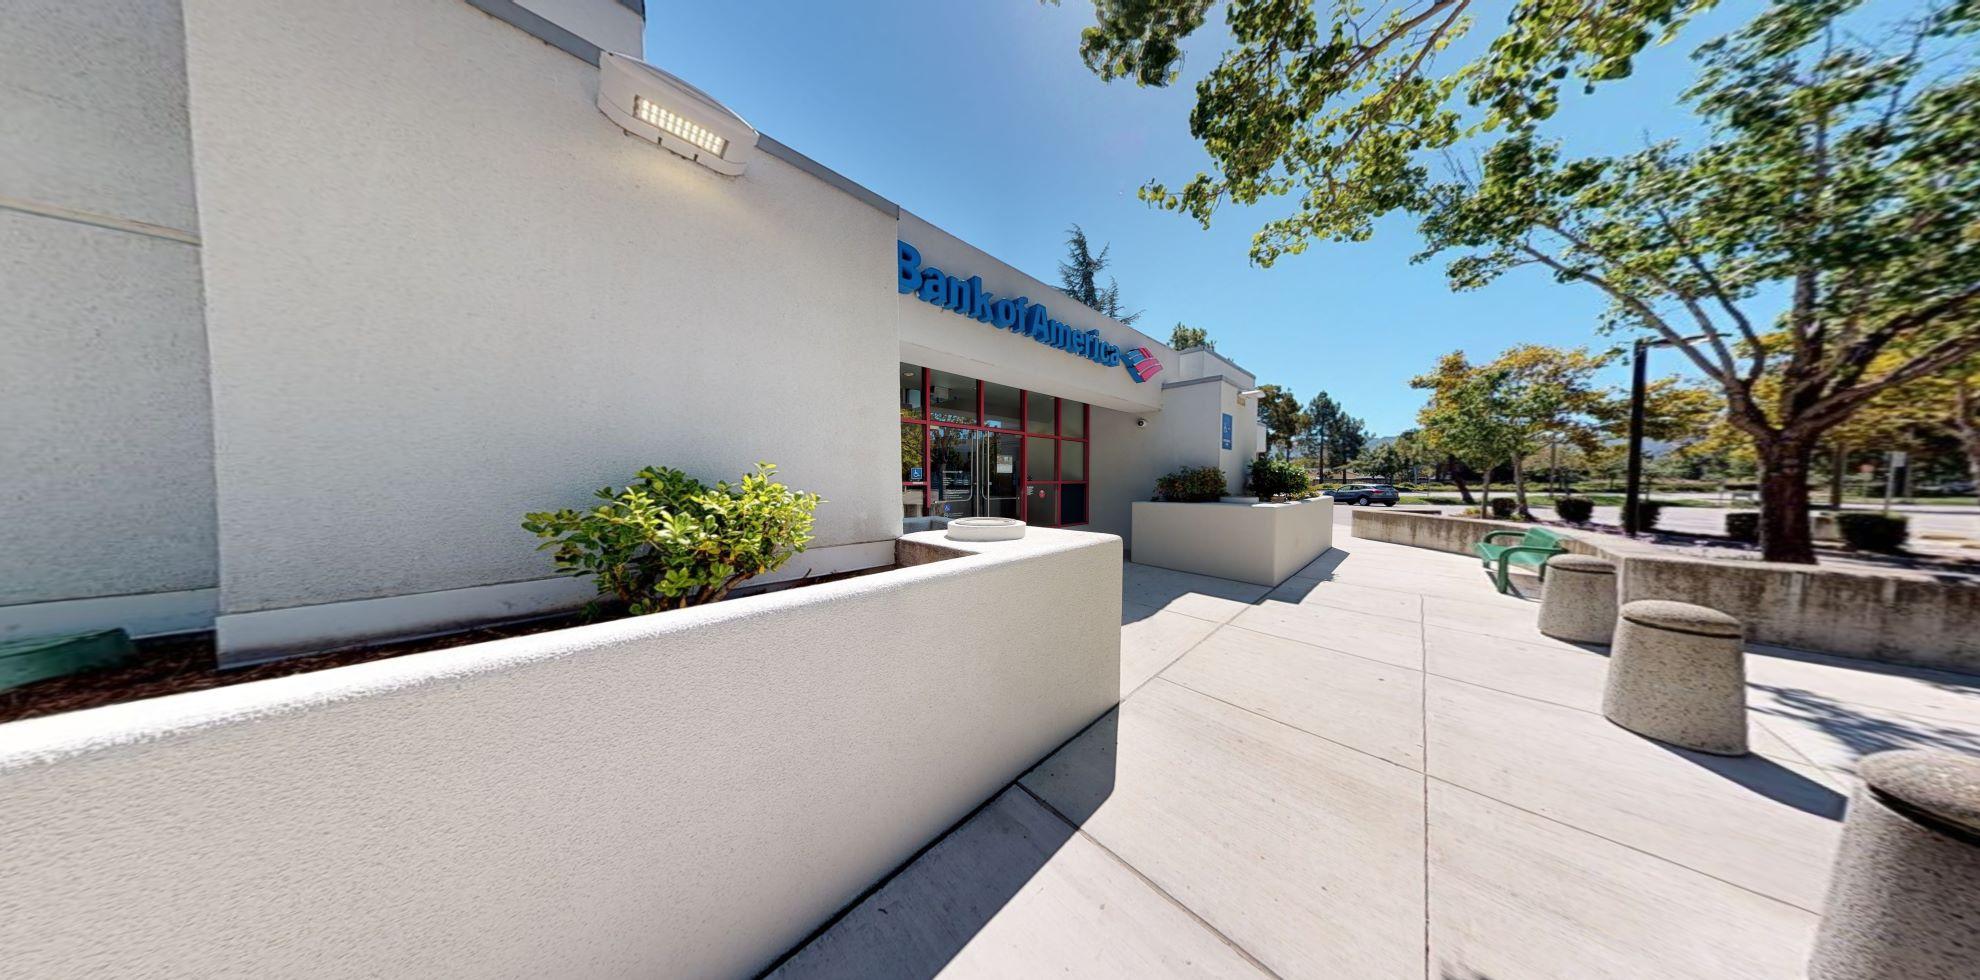 Bank of America financial center with walk-up ATM   6005 Stoneridge Dr, Pleasanton, CA 94588